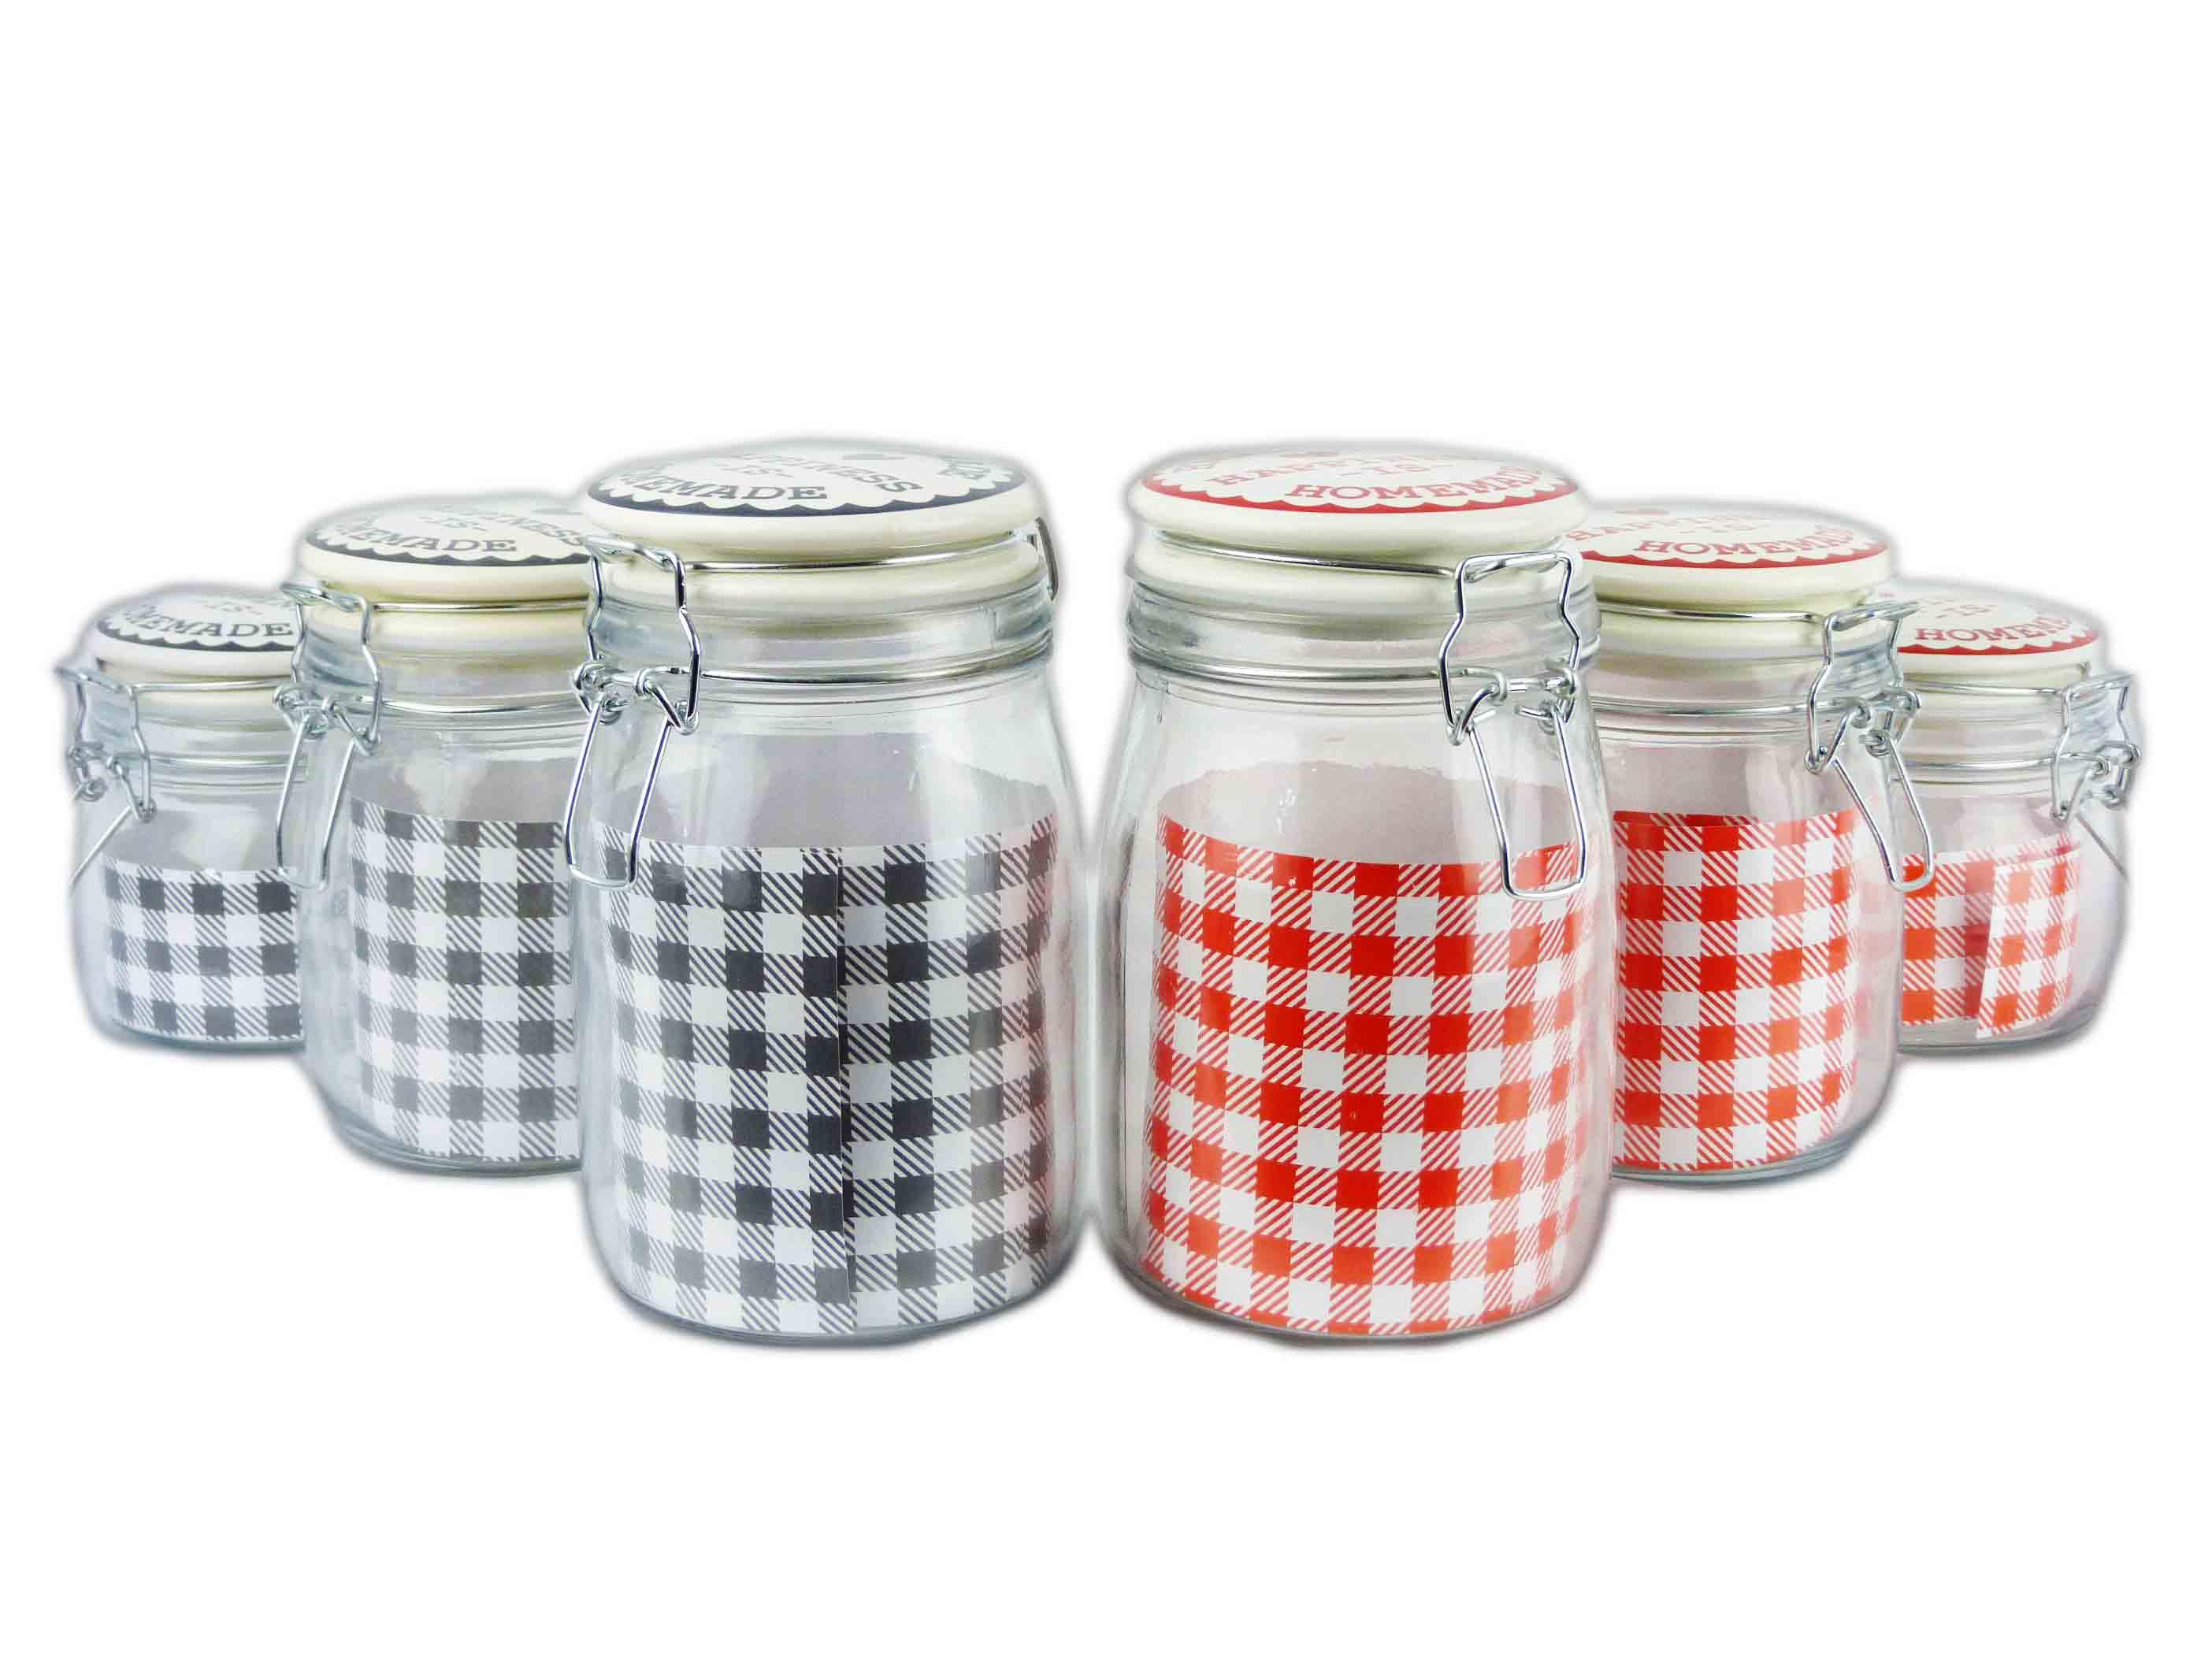 Vorratsbehälter Home Vorratsglas Einmachglas Vorratsgefäß Bonbonglas Shabby Glas